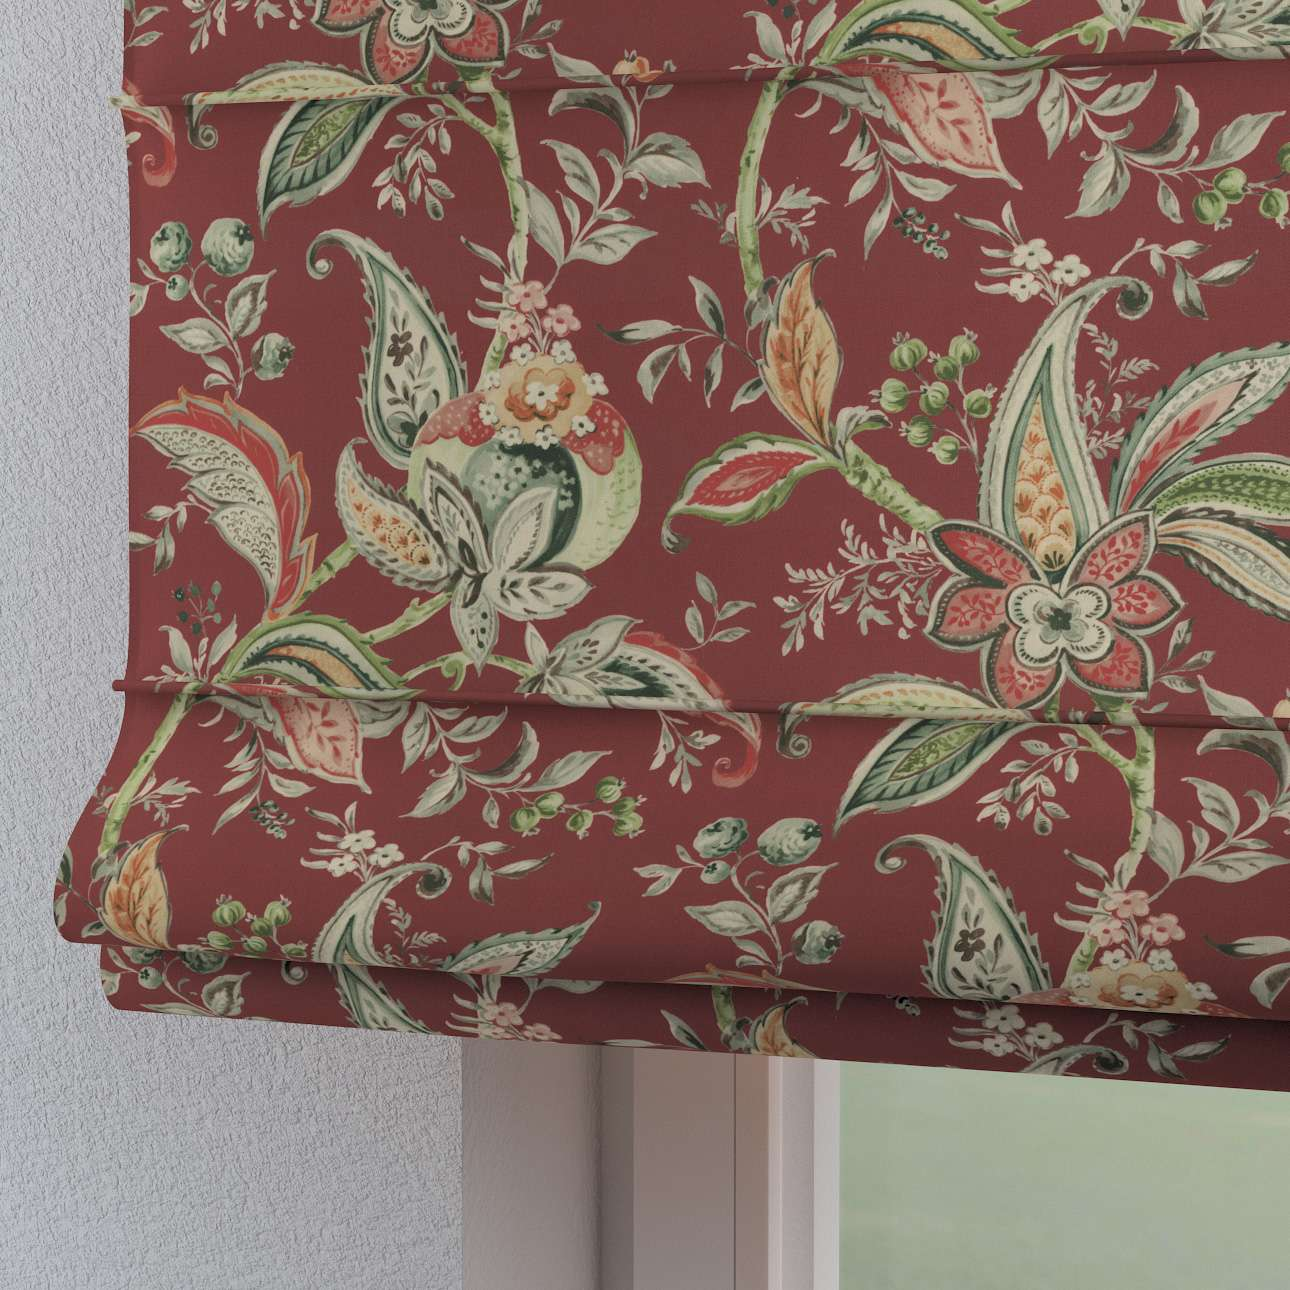 Rímska roleta Torino V kolekcii Gardenia, tkanina: 142-12